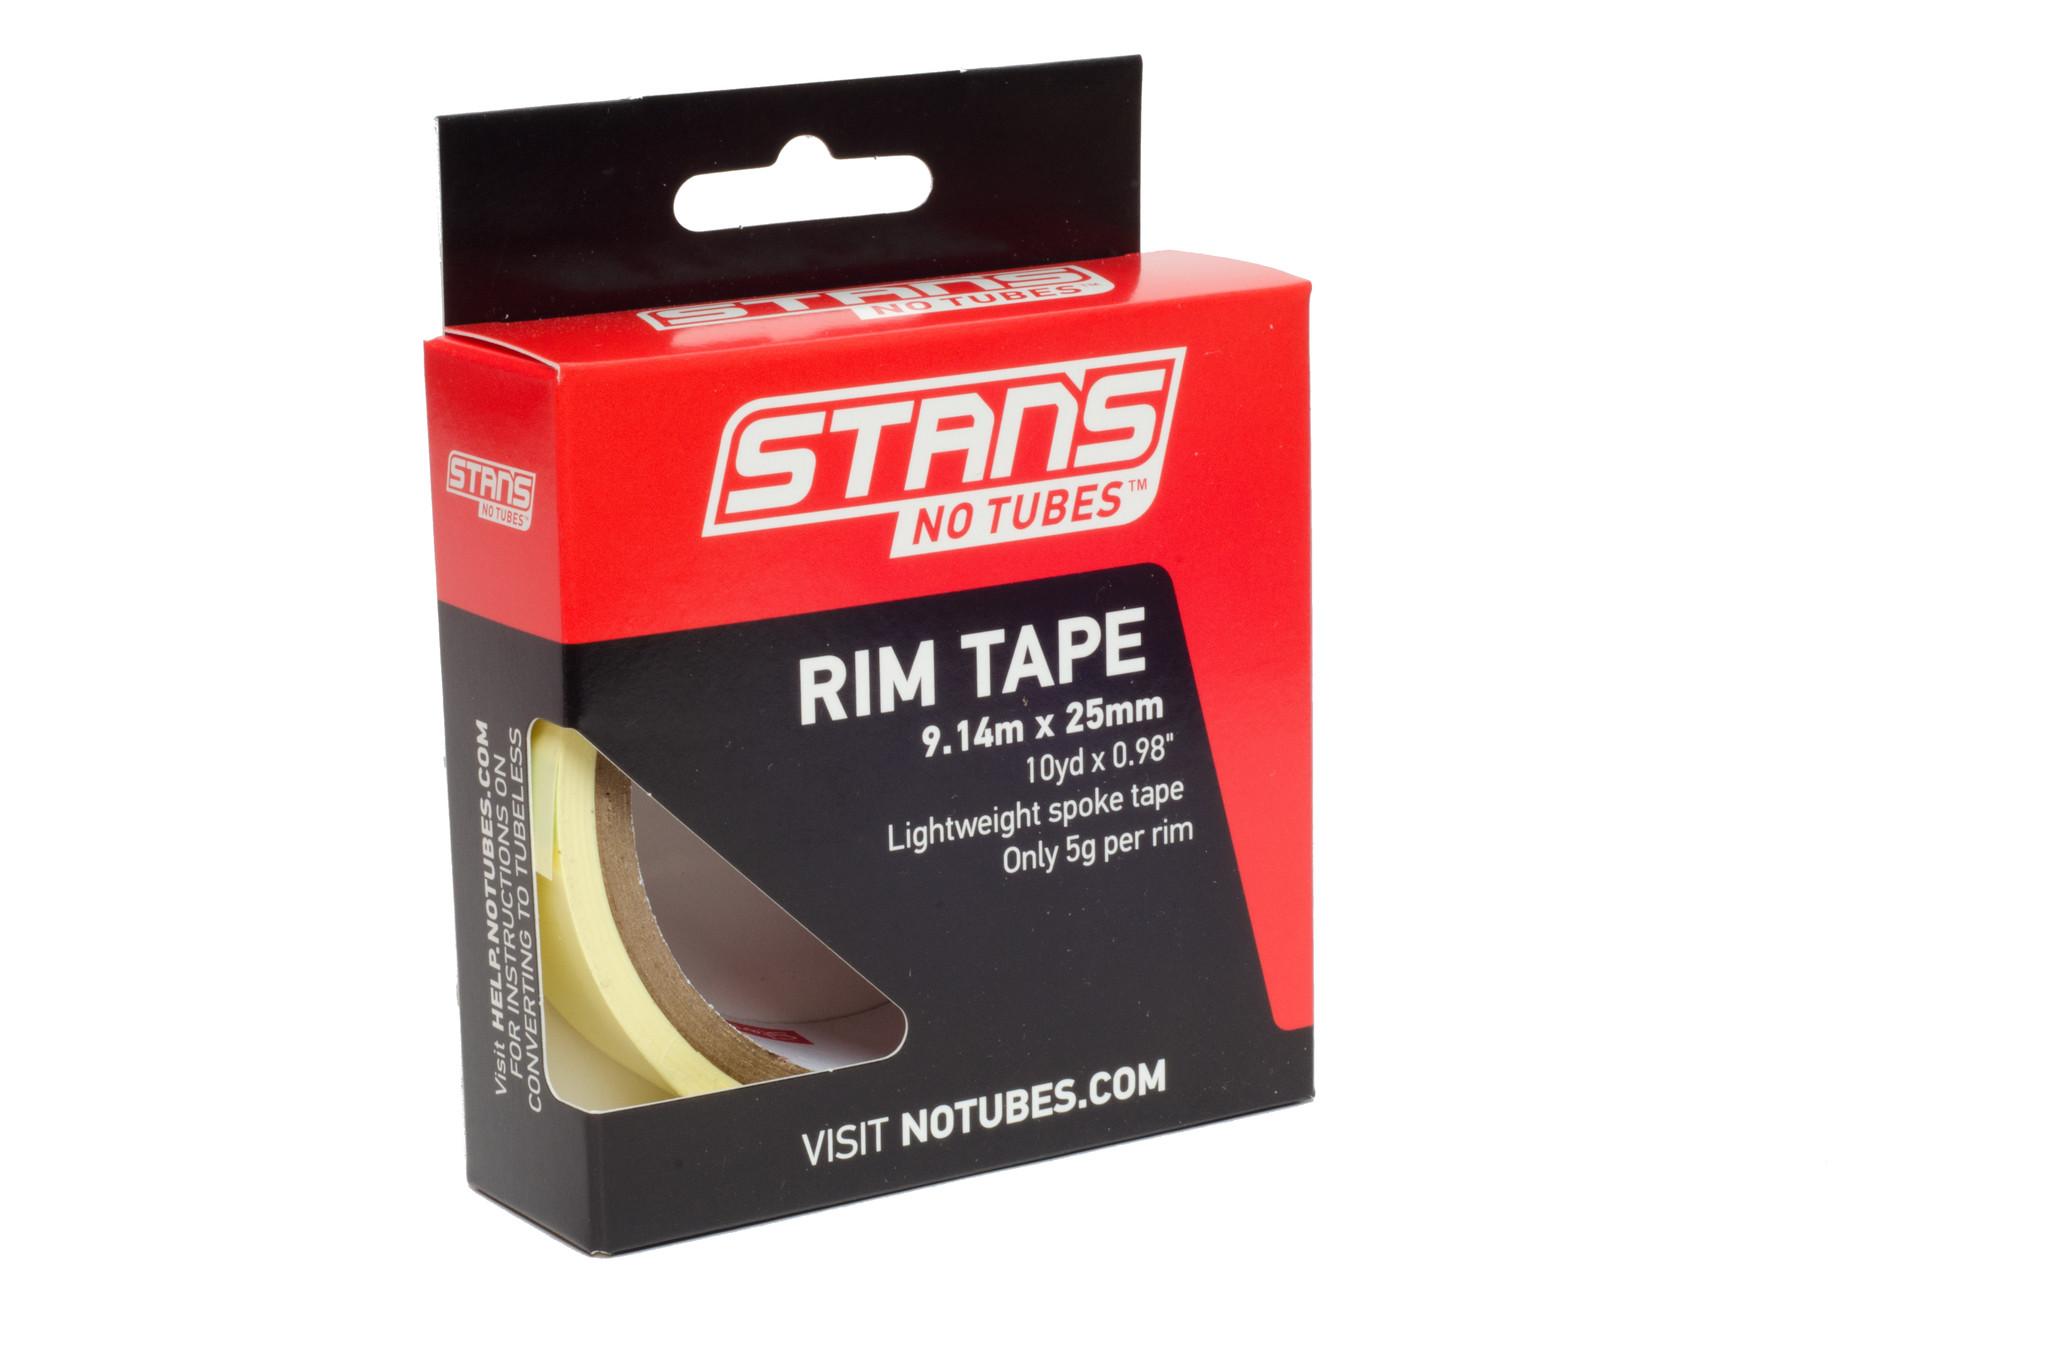 Stans No Tubes Stan's N Tubes, Rim Tape, Yellow, 25mm x 9.14m rll